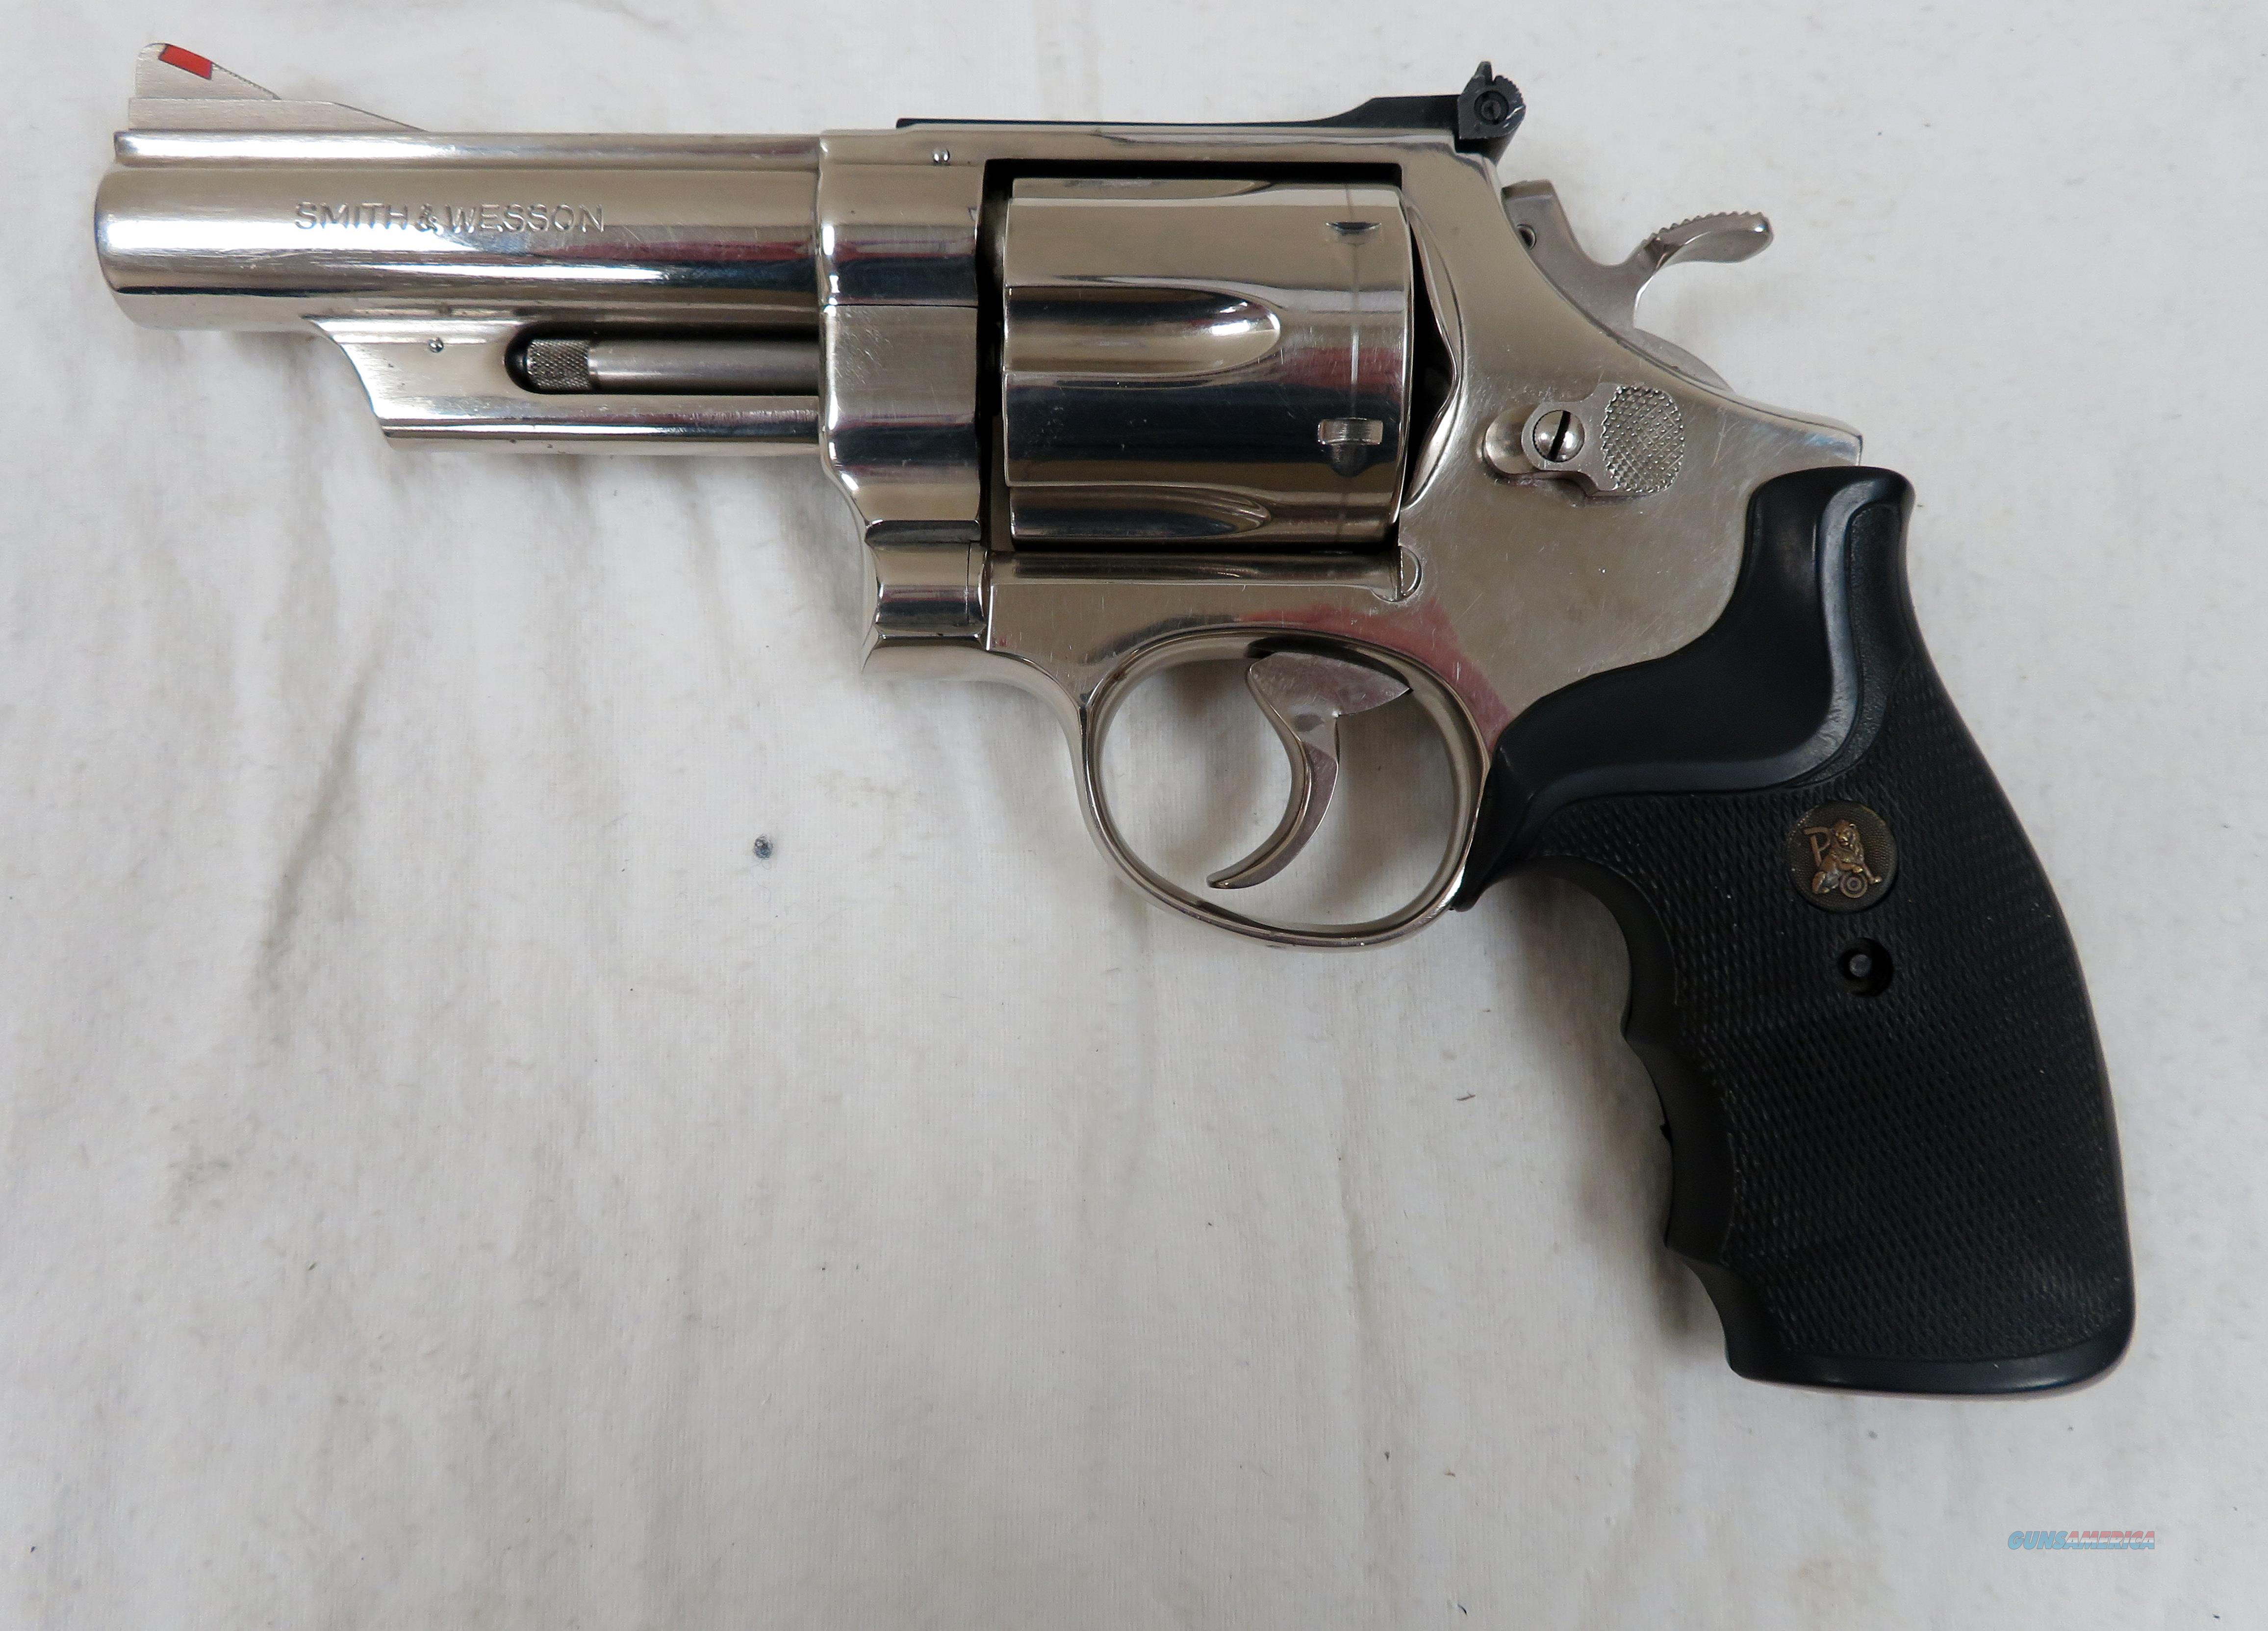 "SMITH & WESSON MODEL 29-2 NICKEL .44 MAGNUM 4""  Guns > Pistols > Smith & Wesson Revolvers > Full Frame Revolver"